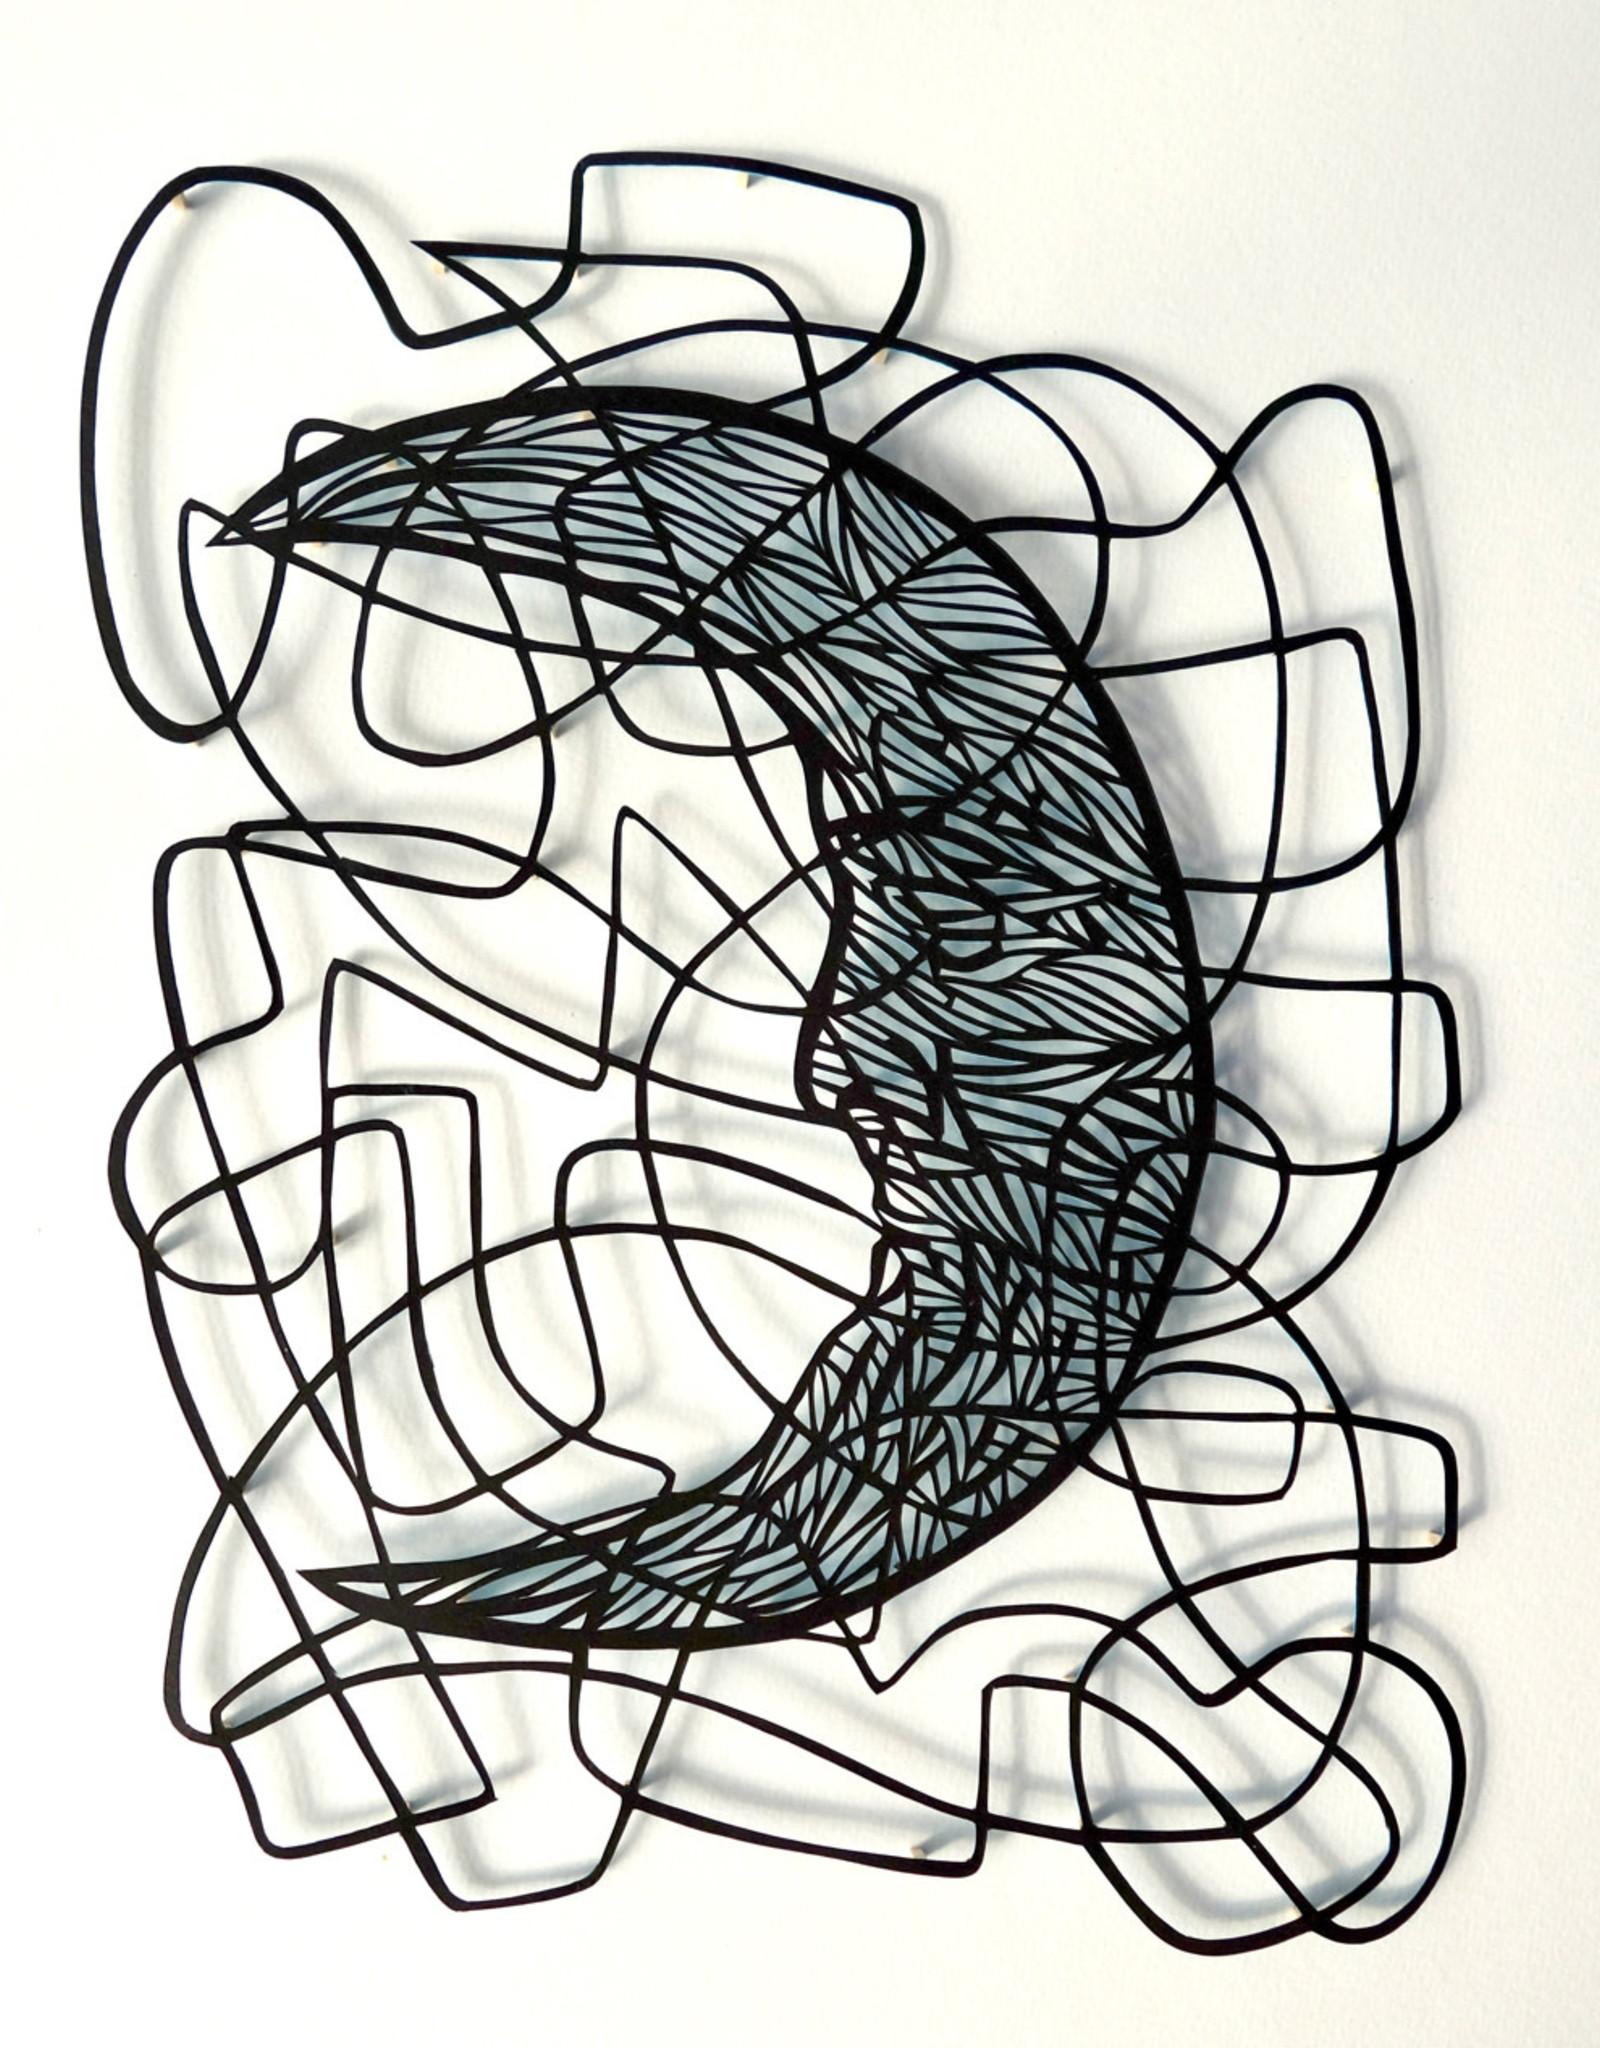 David Friedman Goodnight Moon - Papercut